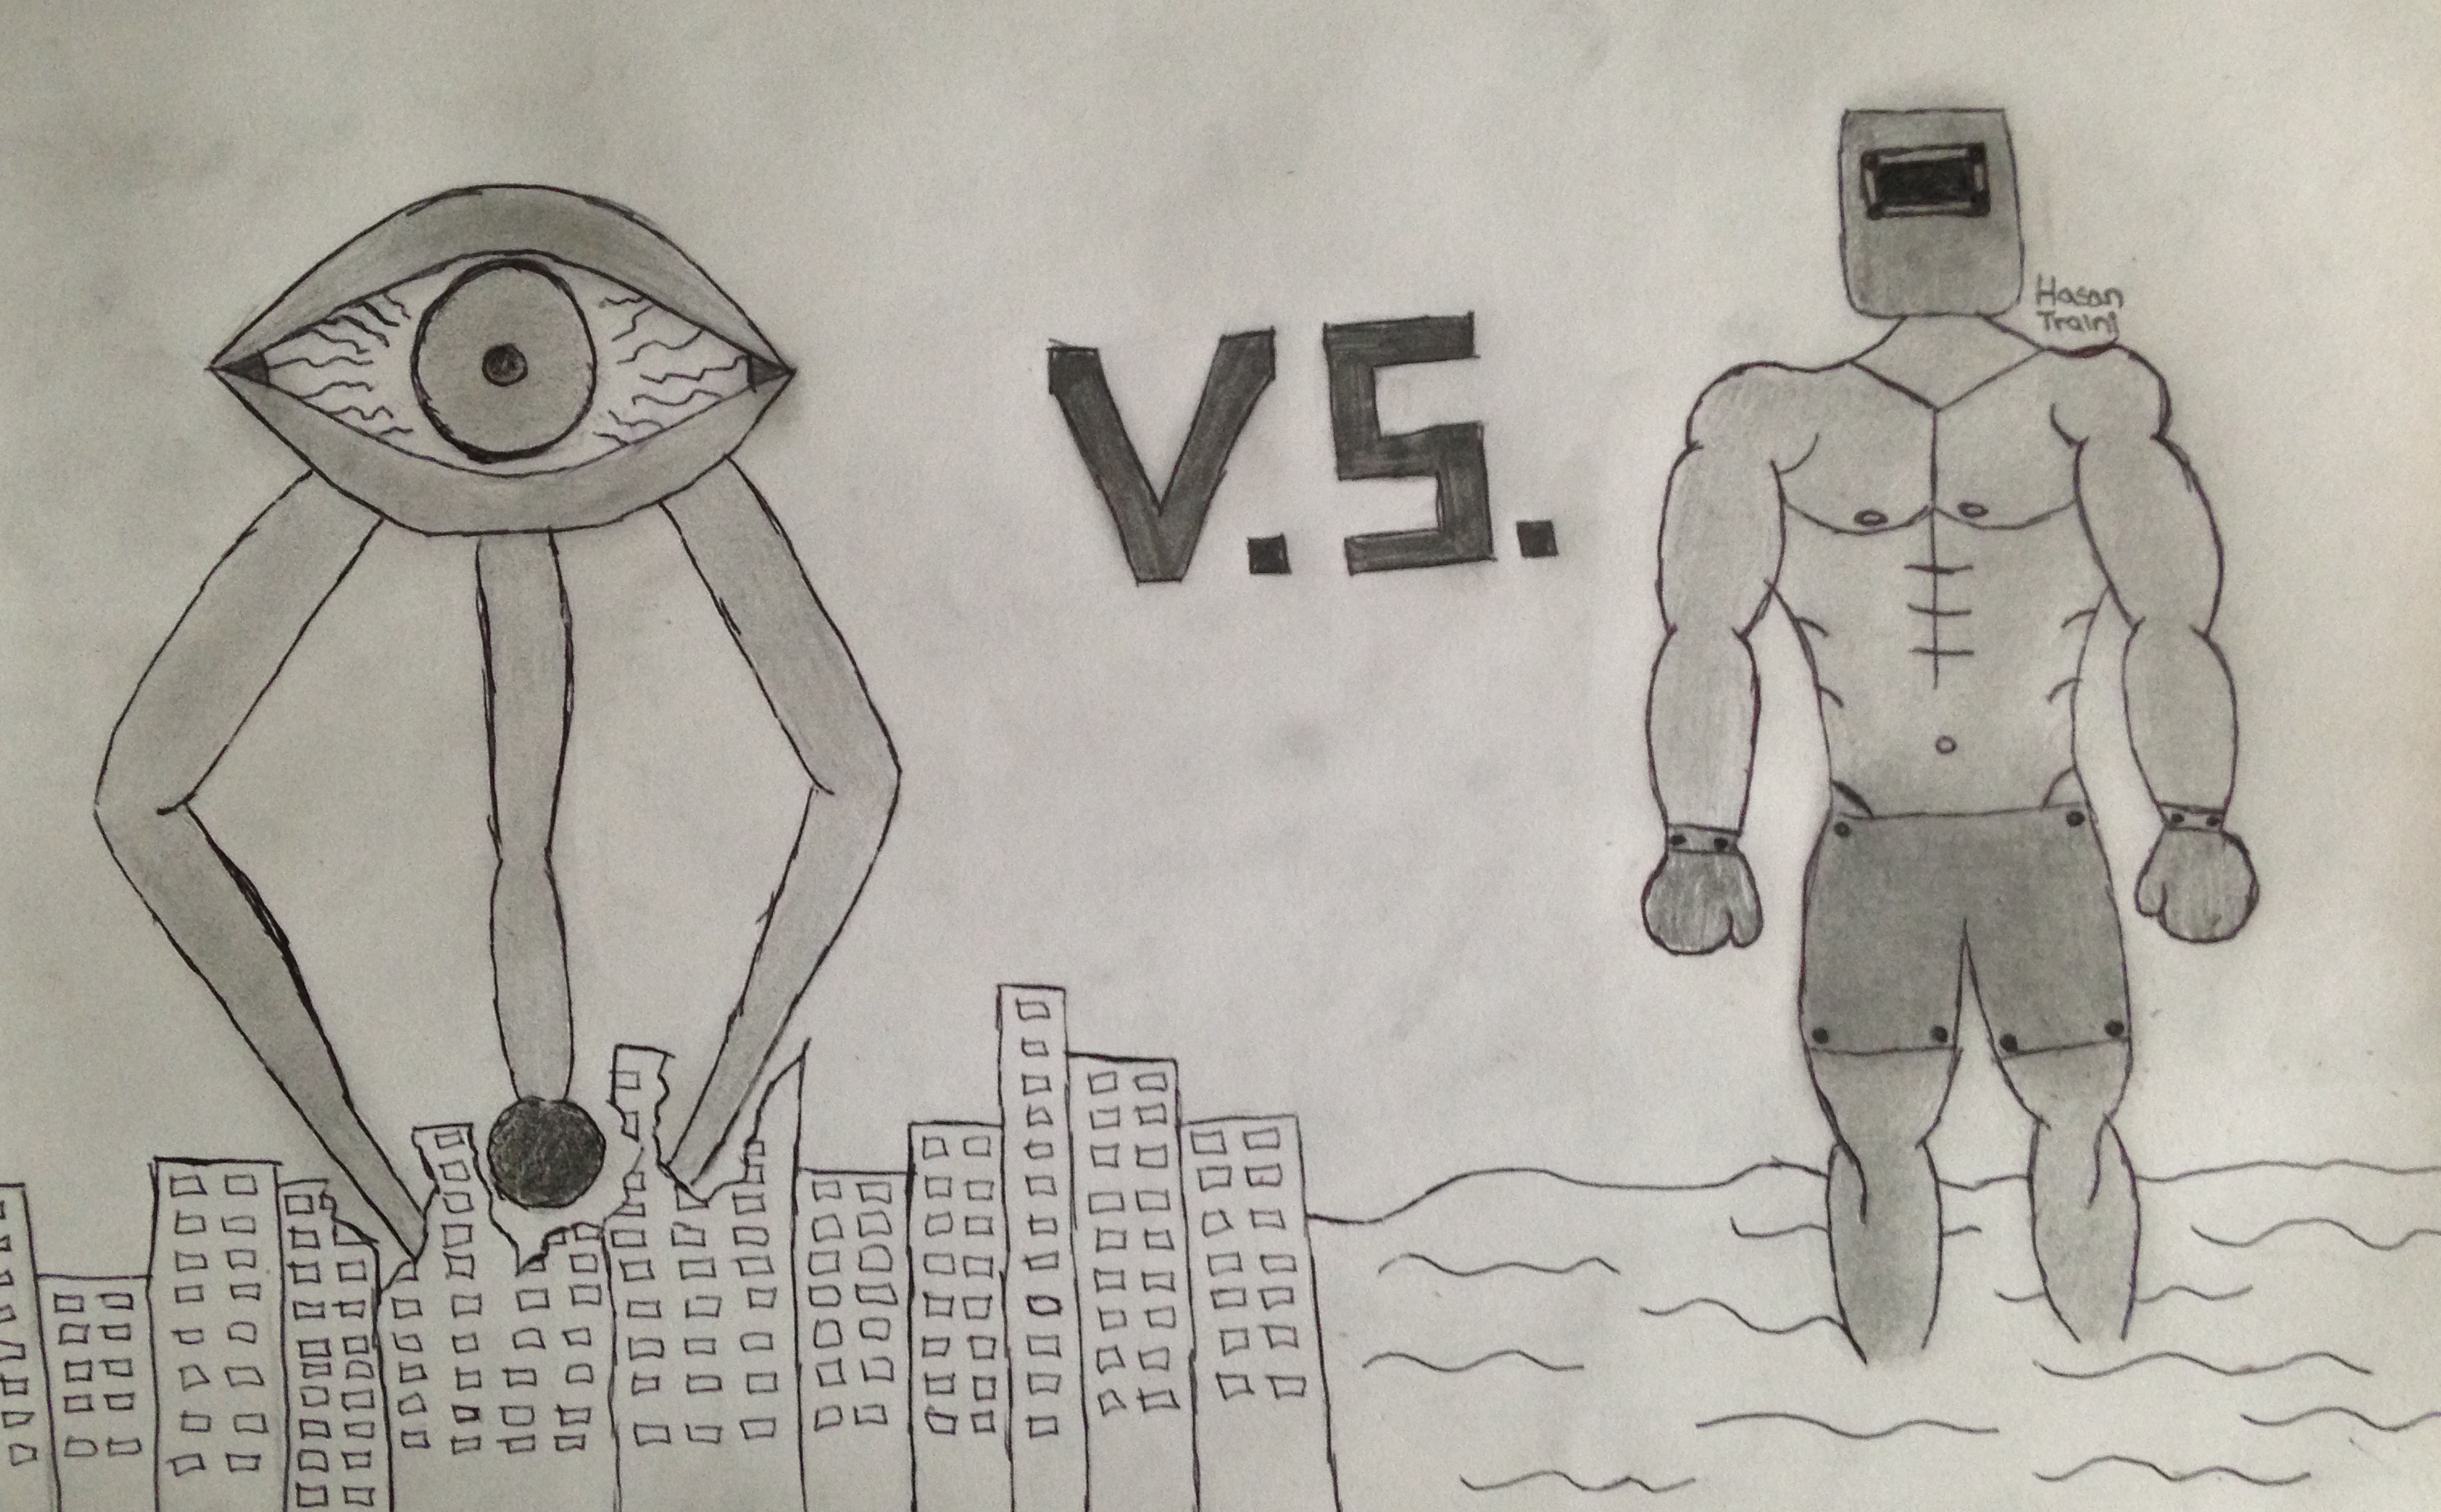 Walkeye VS Ironmuscles